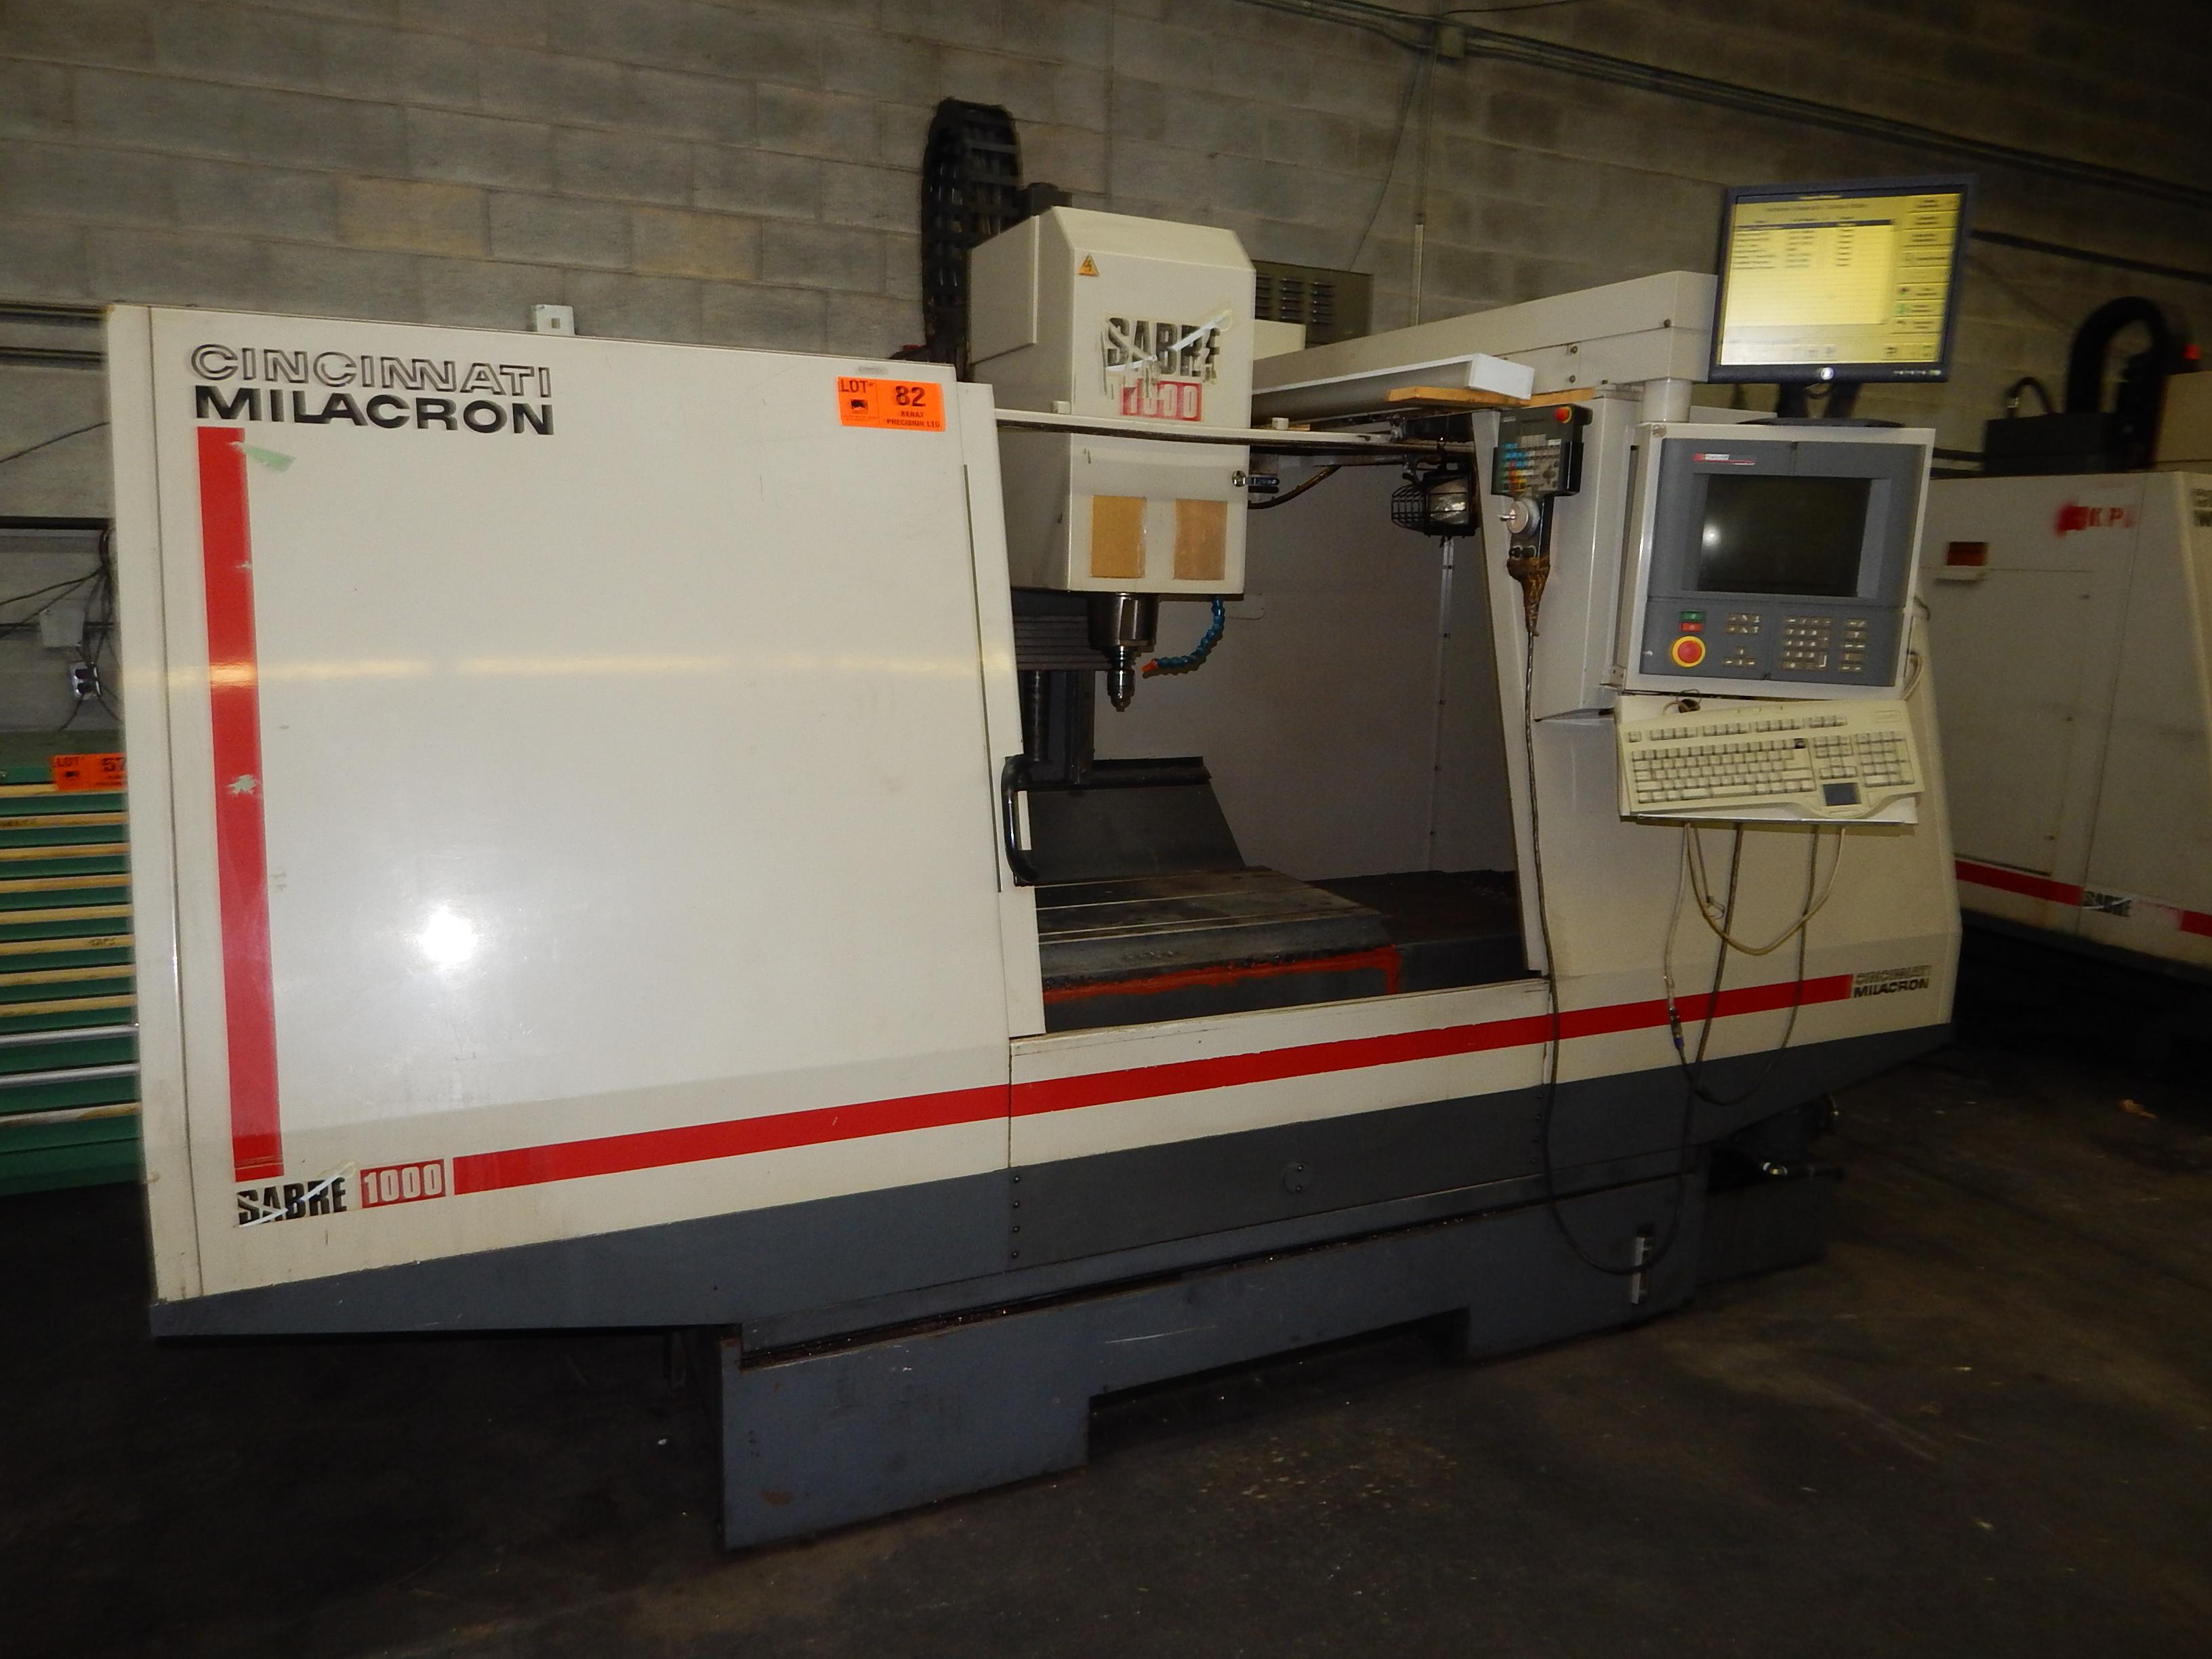 Lot 82 - CINCINNATI MILACRON SABRE 1000 ERH CNC VERTICAL MACHINING CENTER  WITH ACRAMATIC 2100 CNC